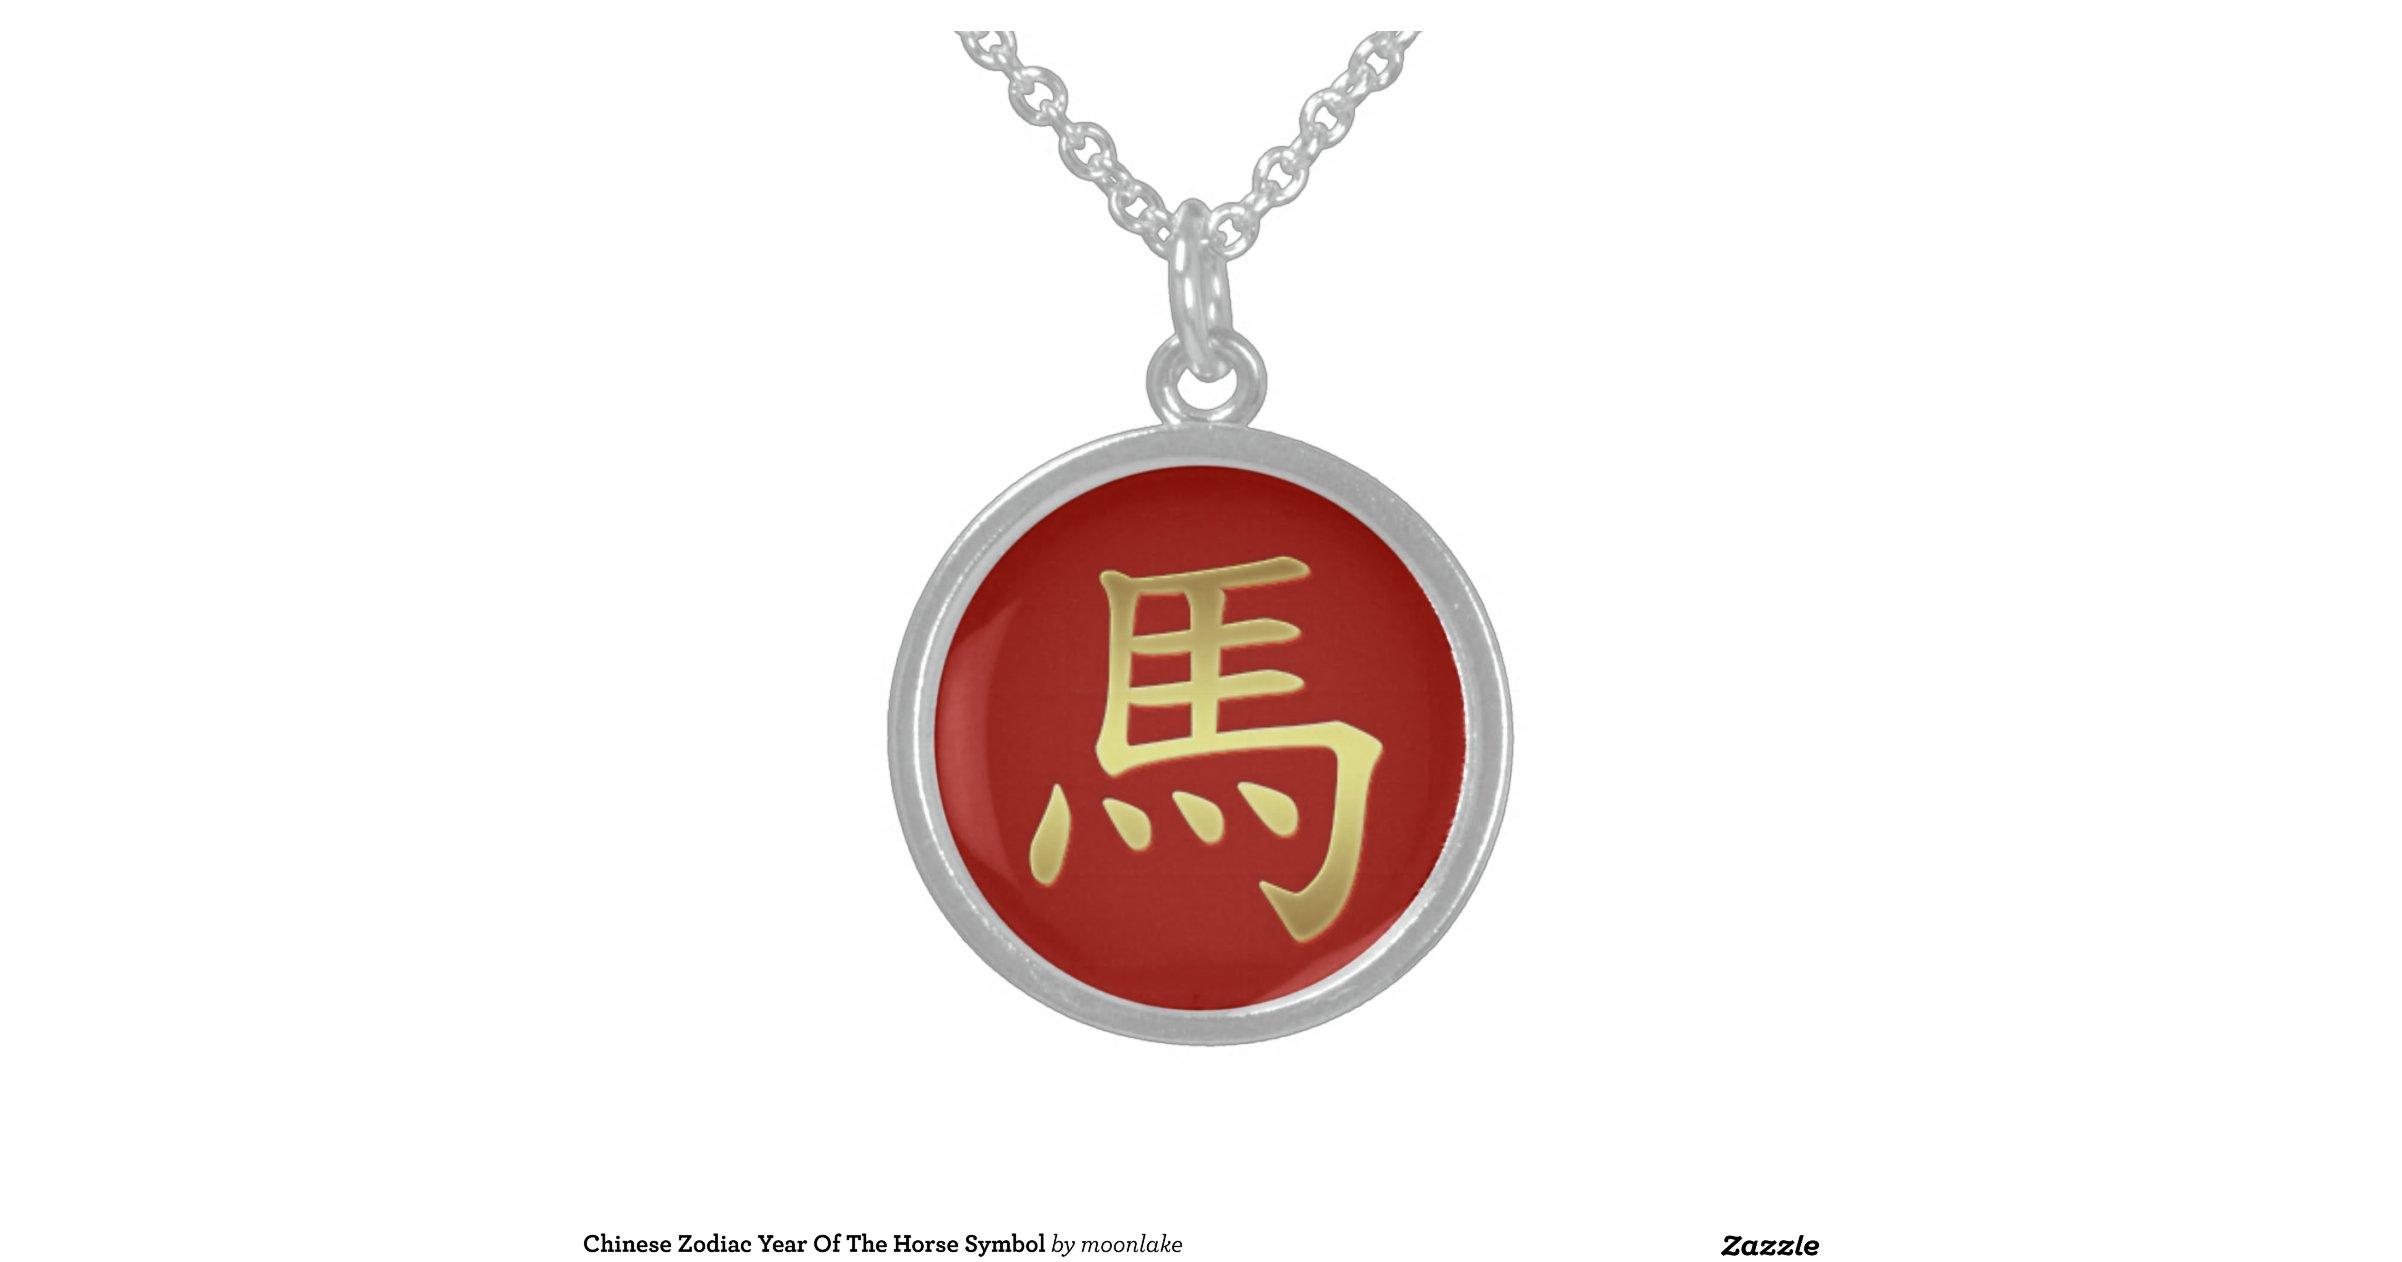 Chinese Zodiac Year Of The Horse Symbol Necklace | Zazzle